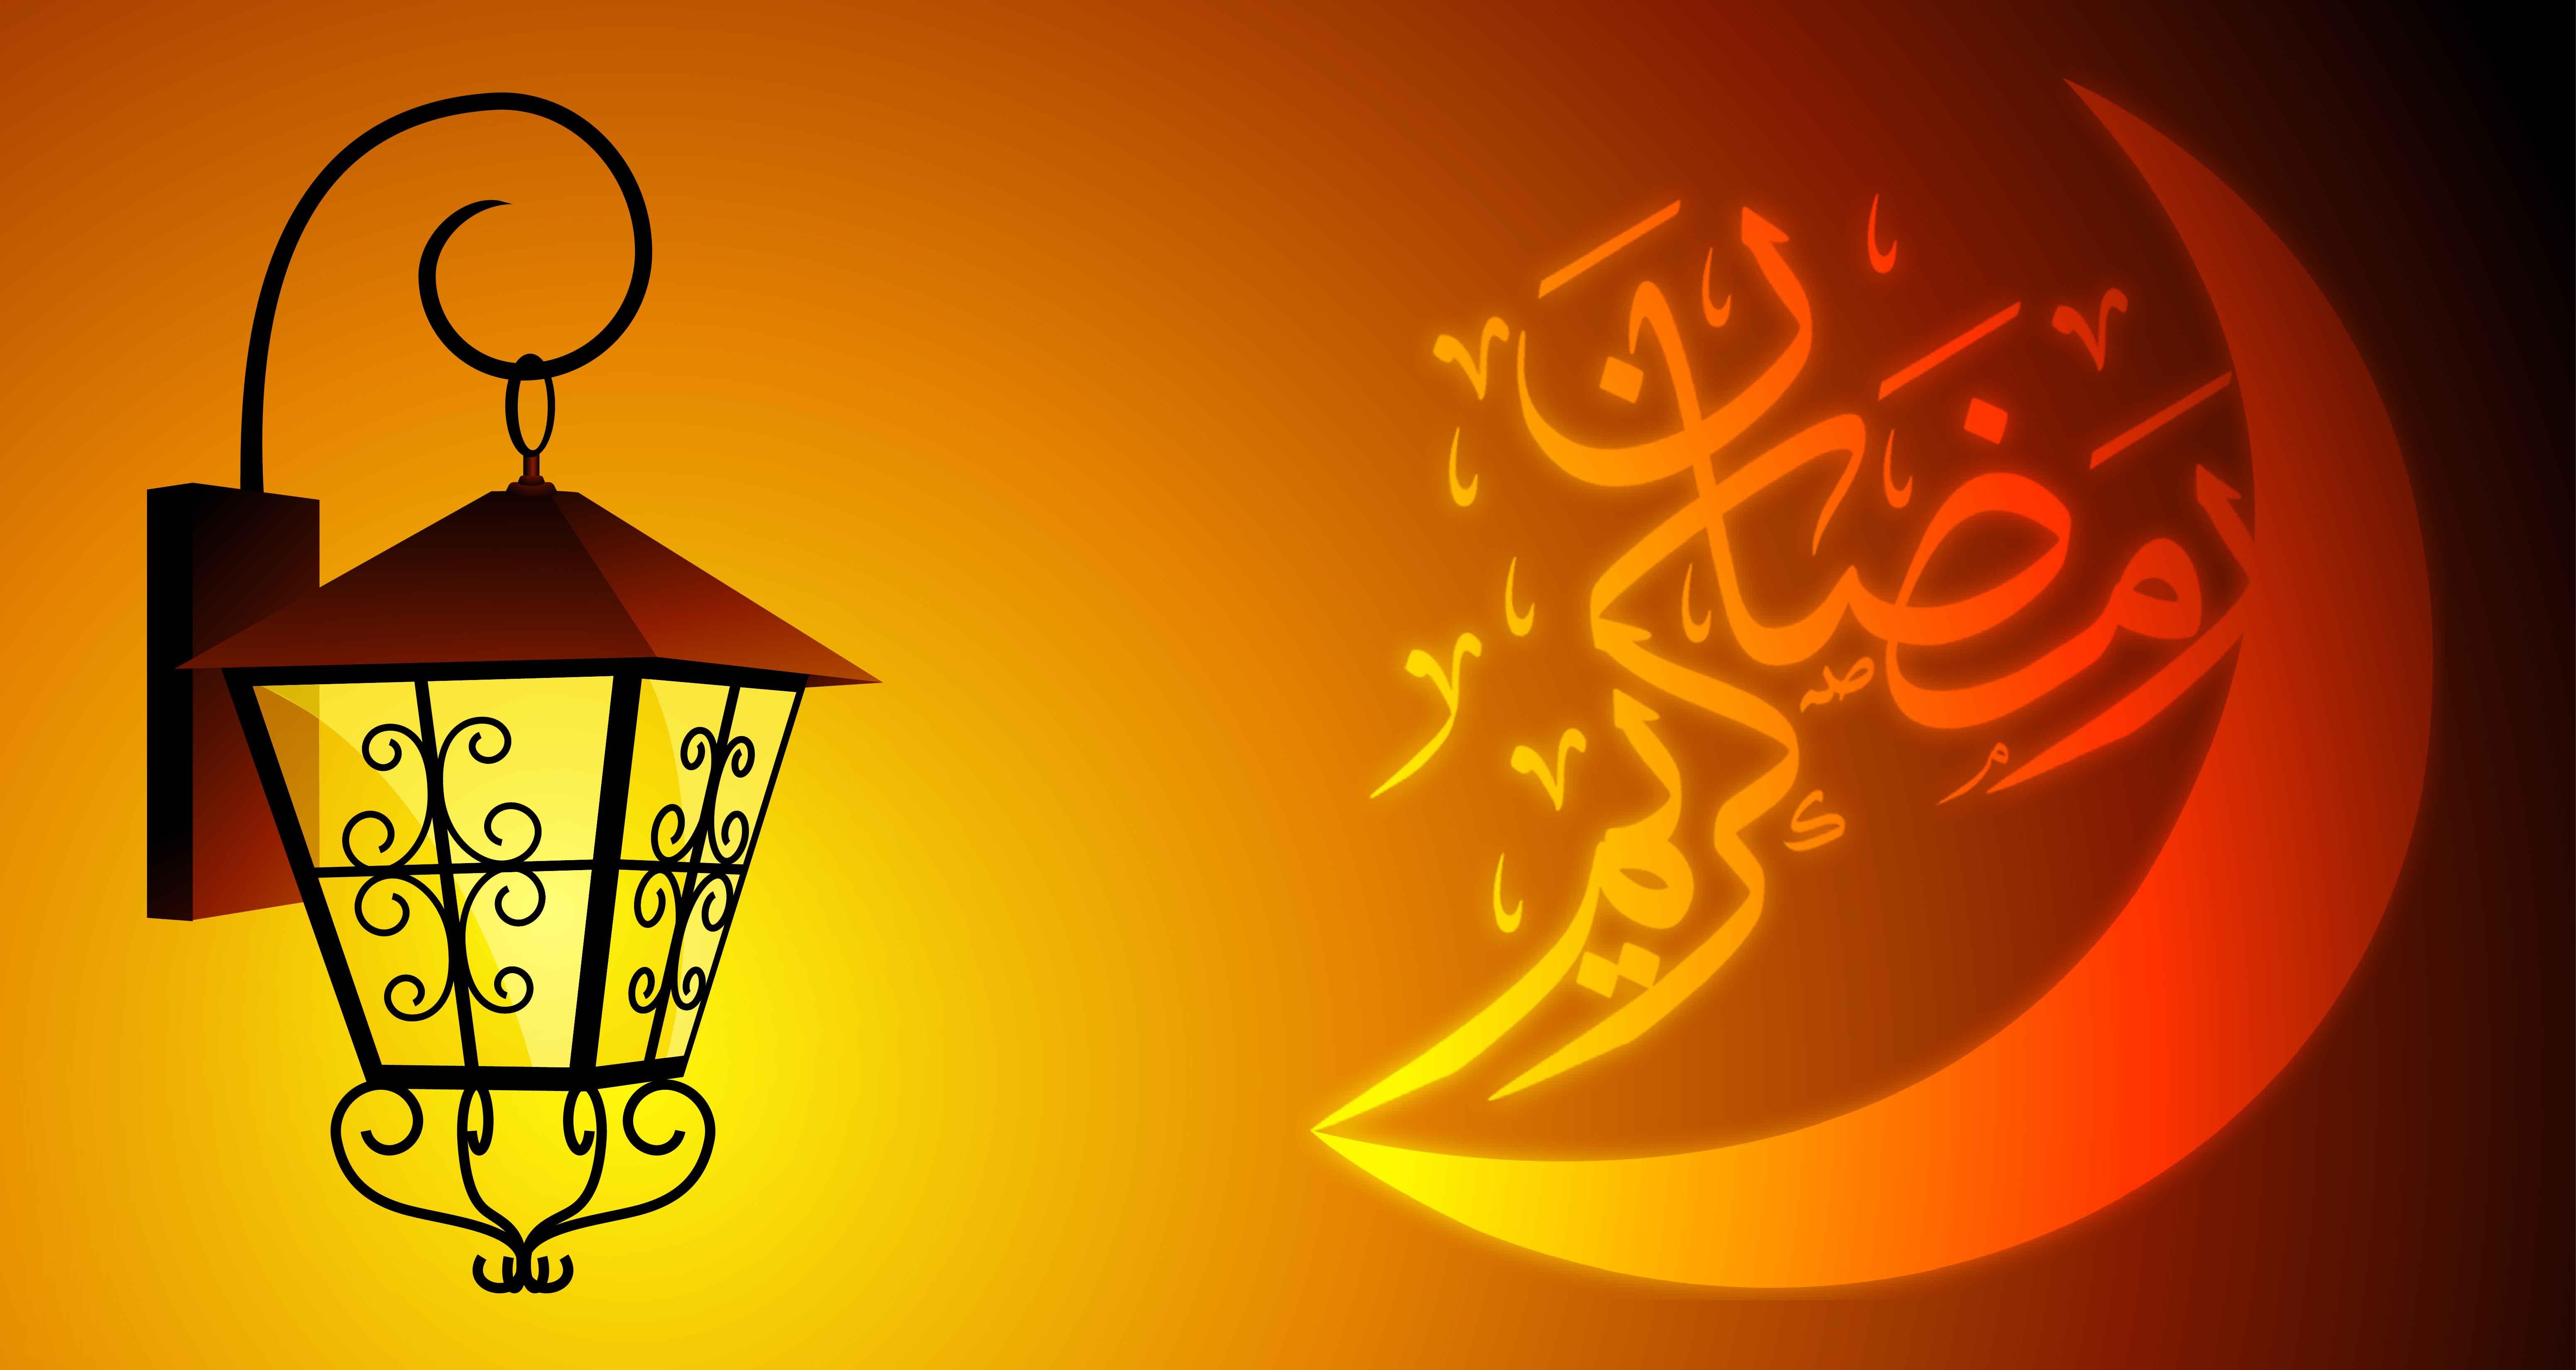 متى رمضان؟